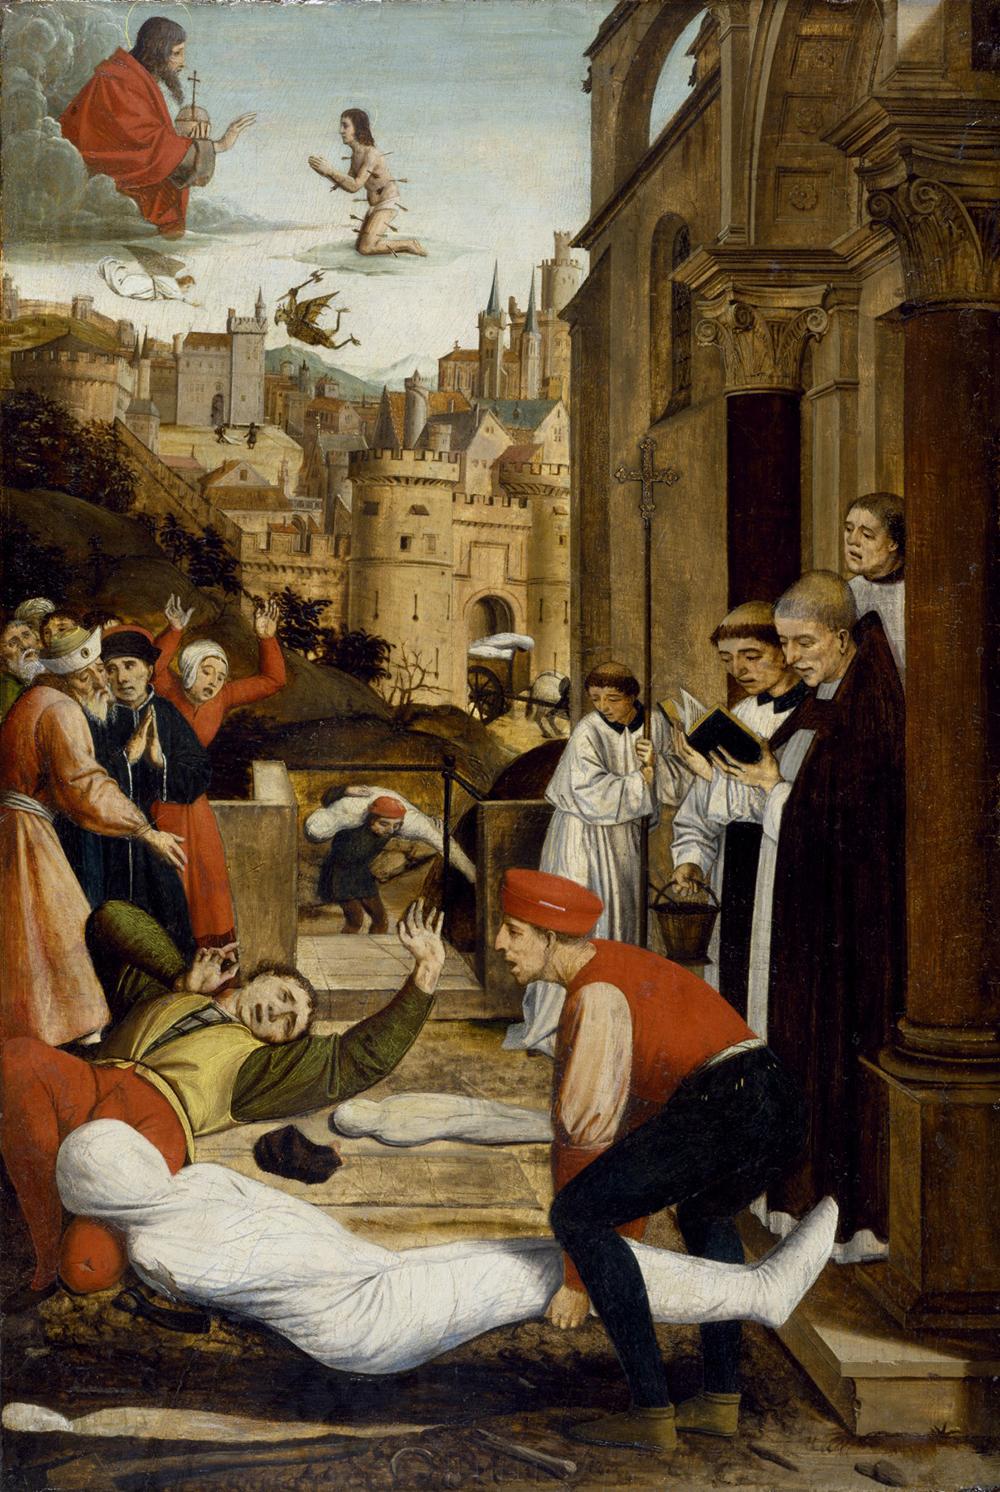 Saint Sebastian Interceding for the Plague Stricken, by Josse Lieferinxe, c. 1497.